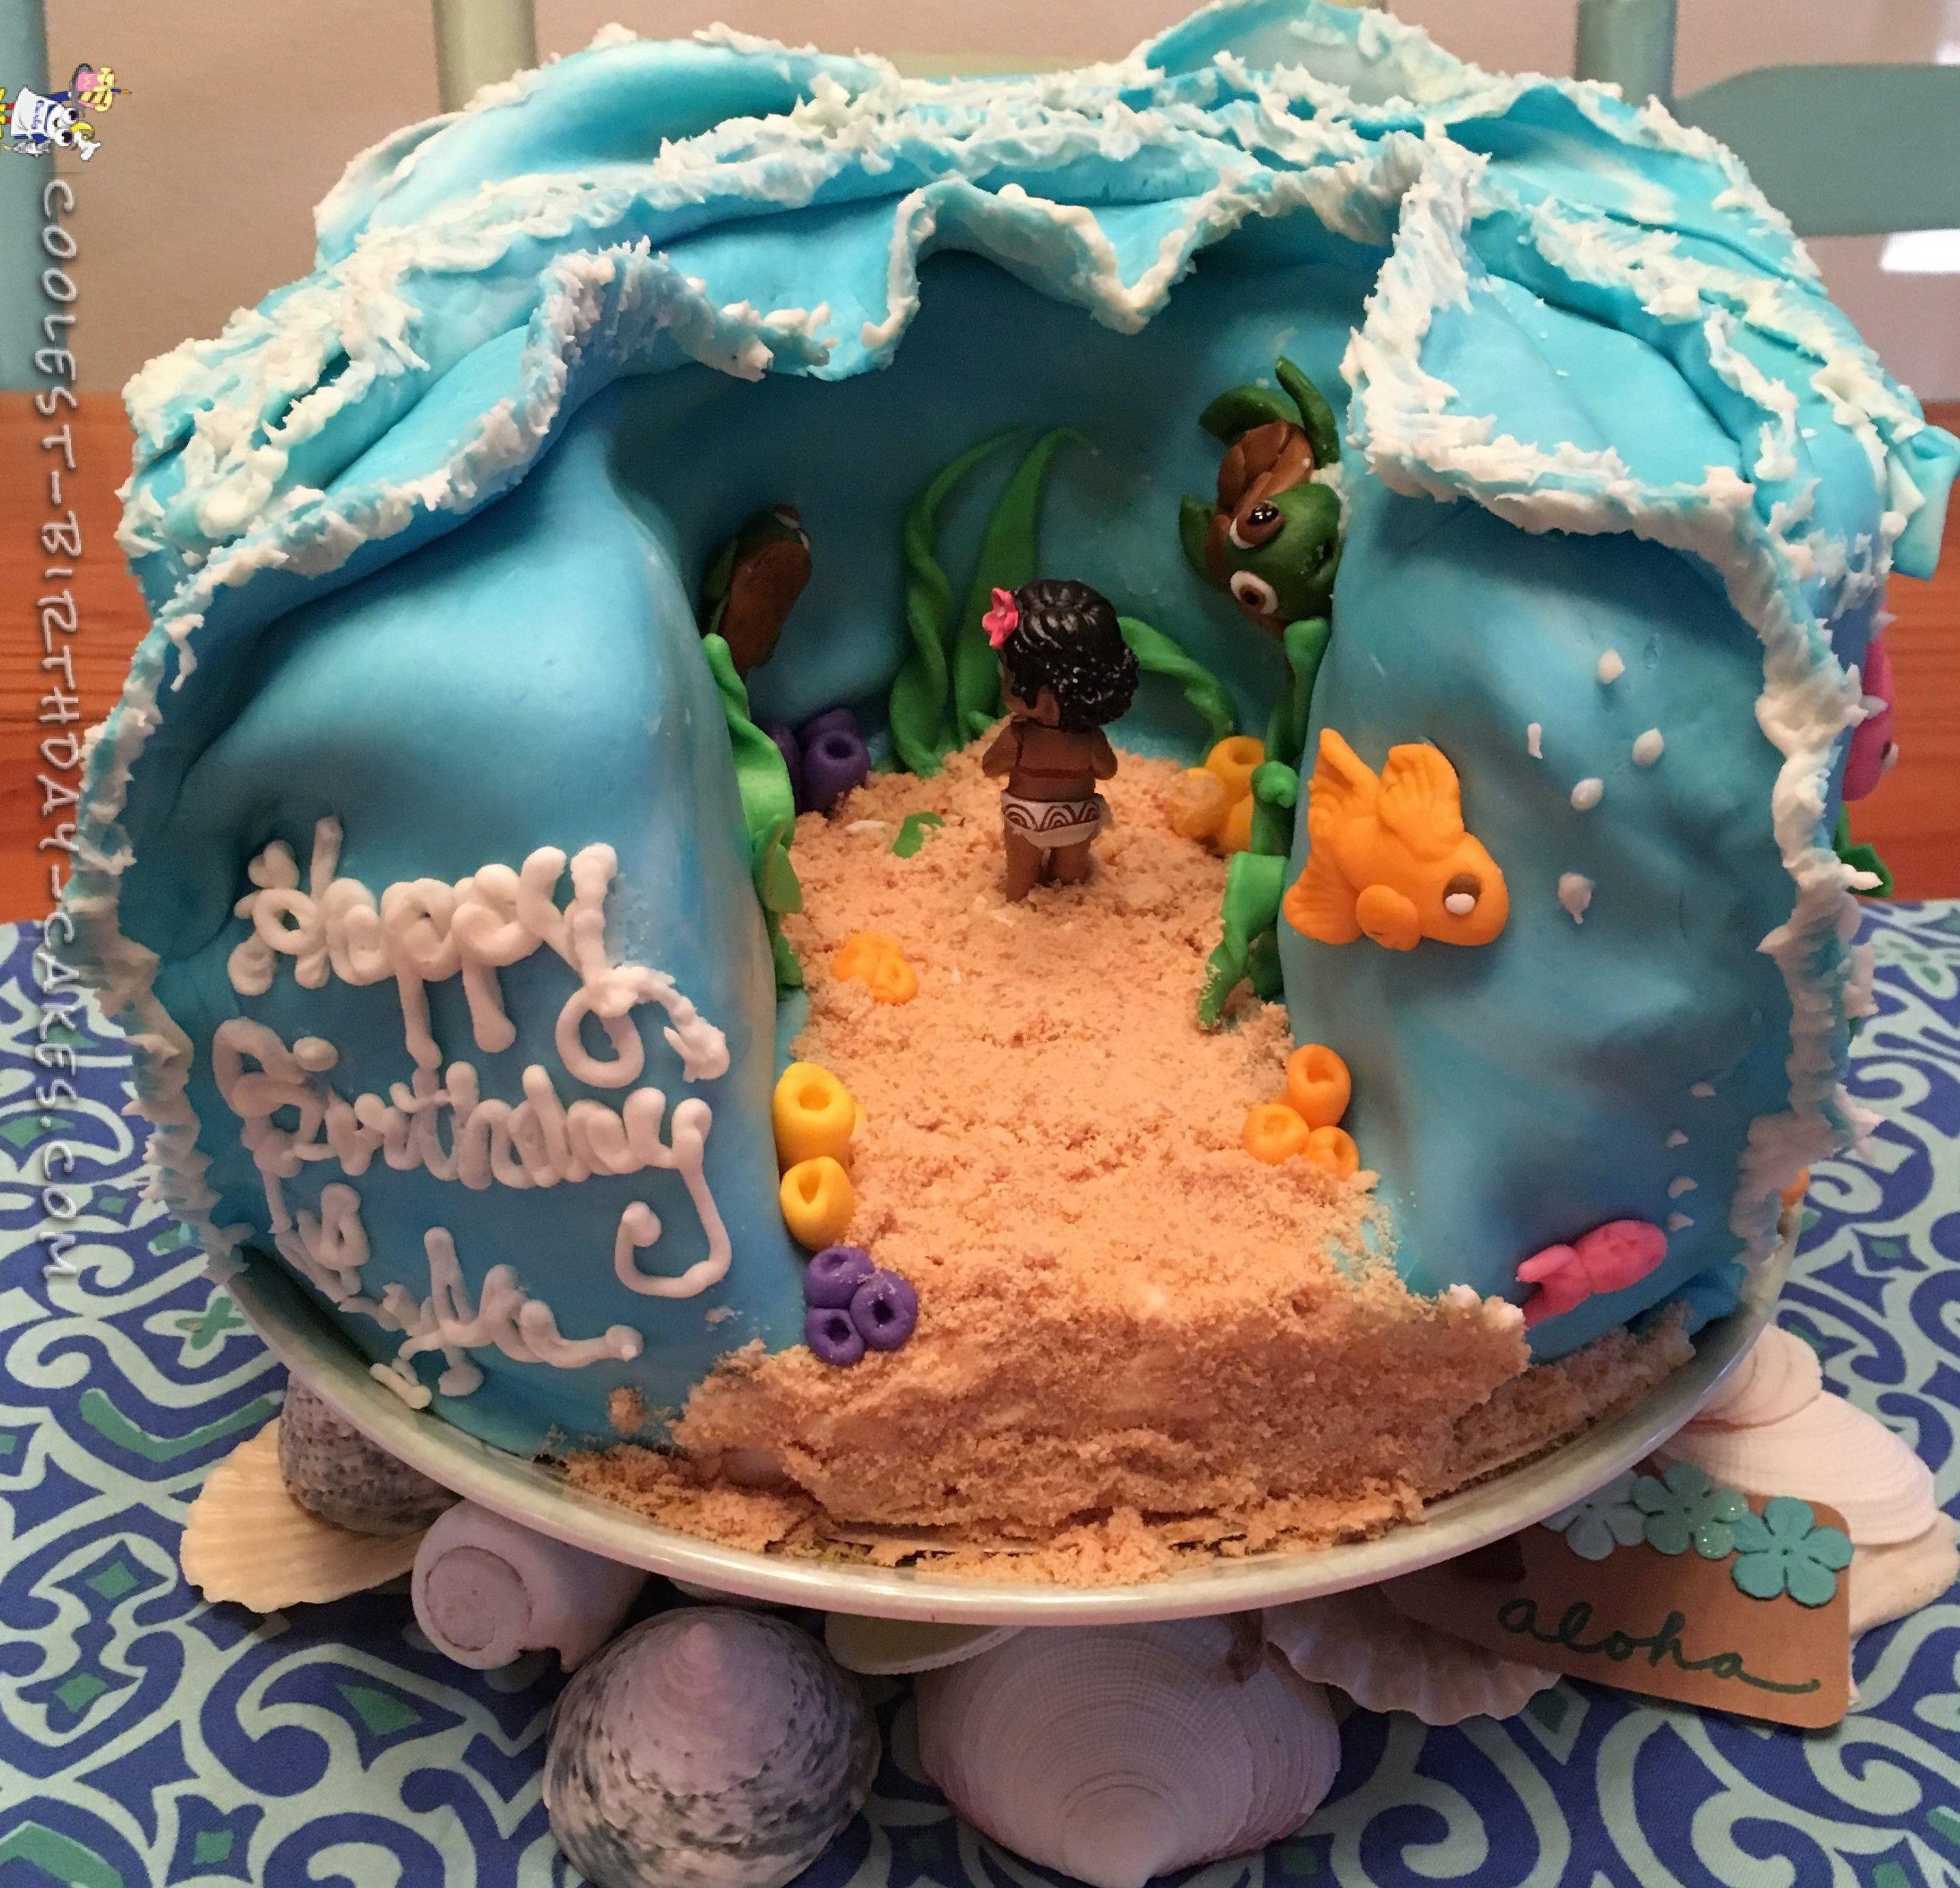 Homemade Birthday Cake Ideas  Cool Homemade Moana Cake